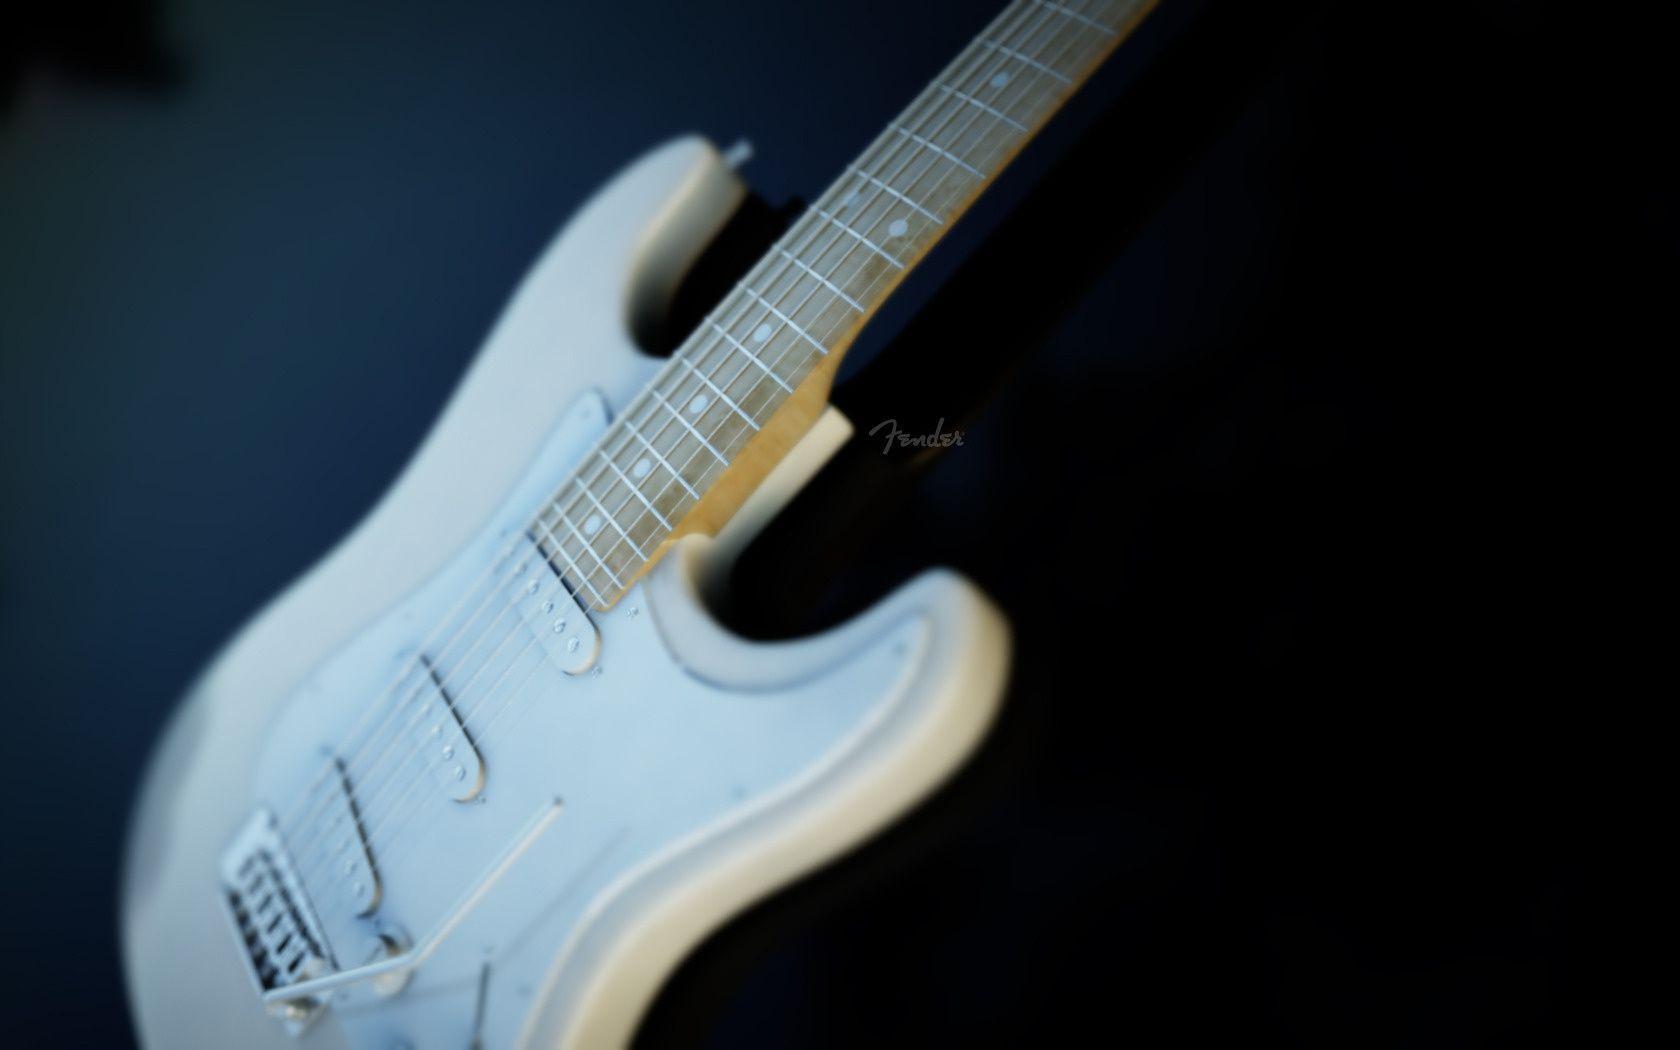 Fender Guitar Wallpapers 1680x1050